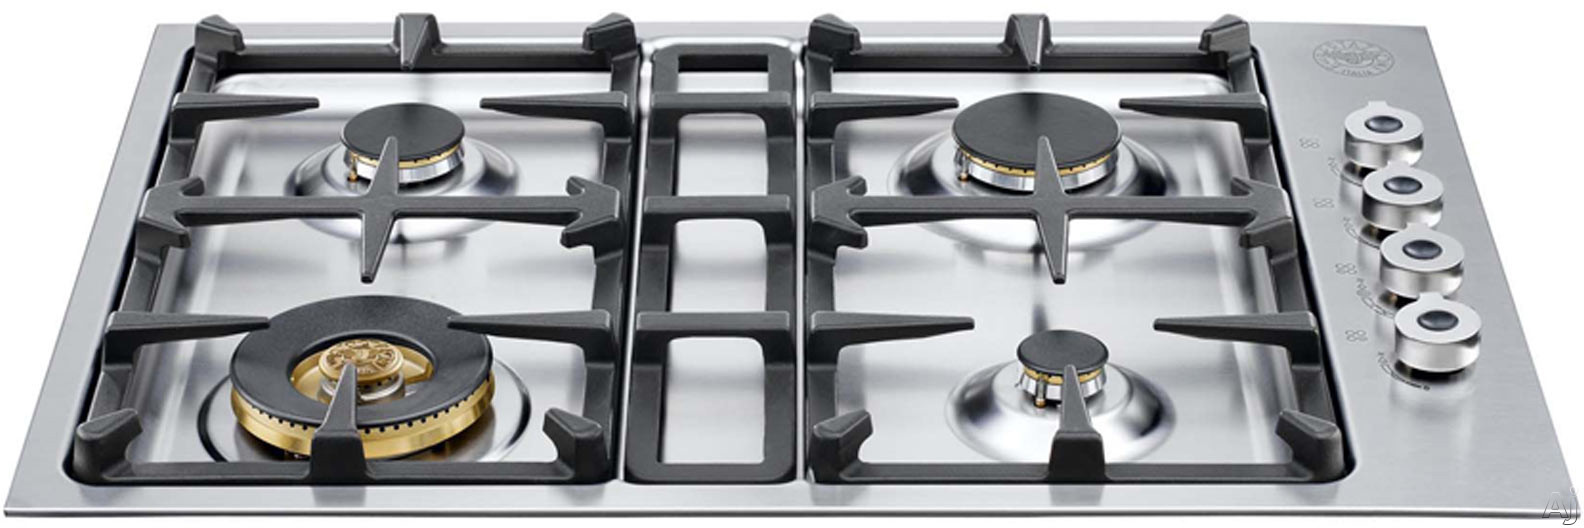 Pin On Kitchen Appliance